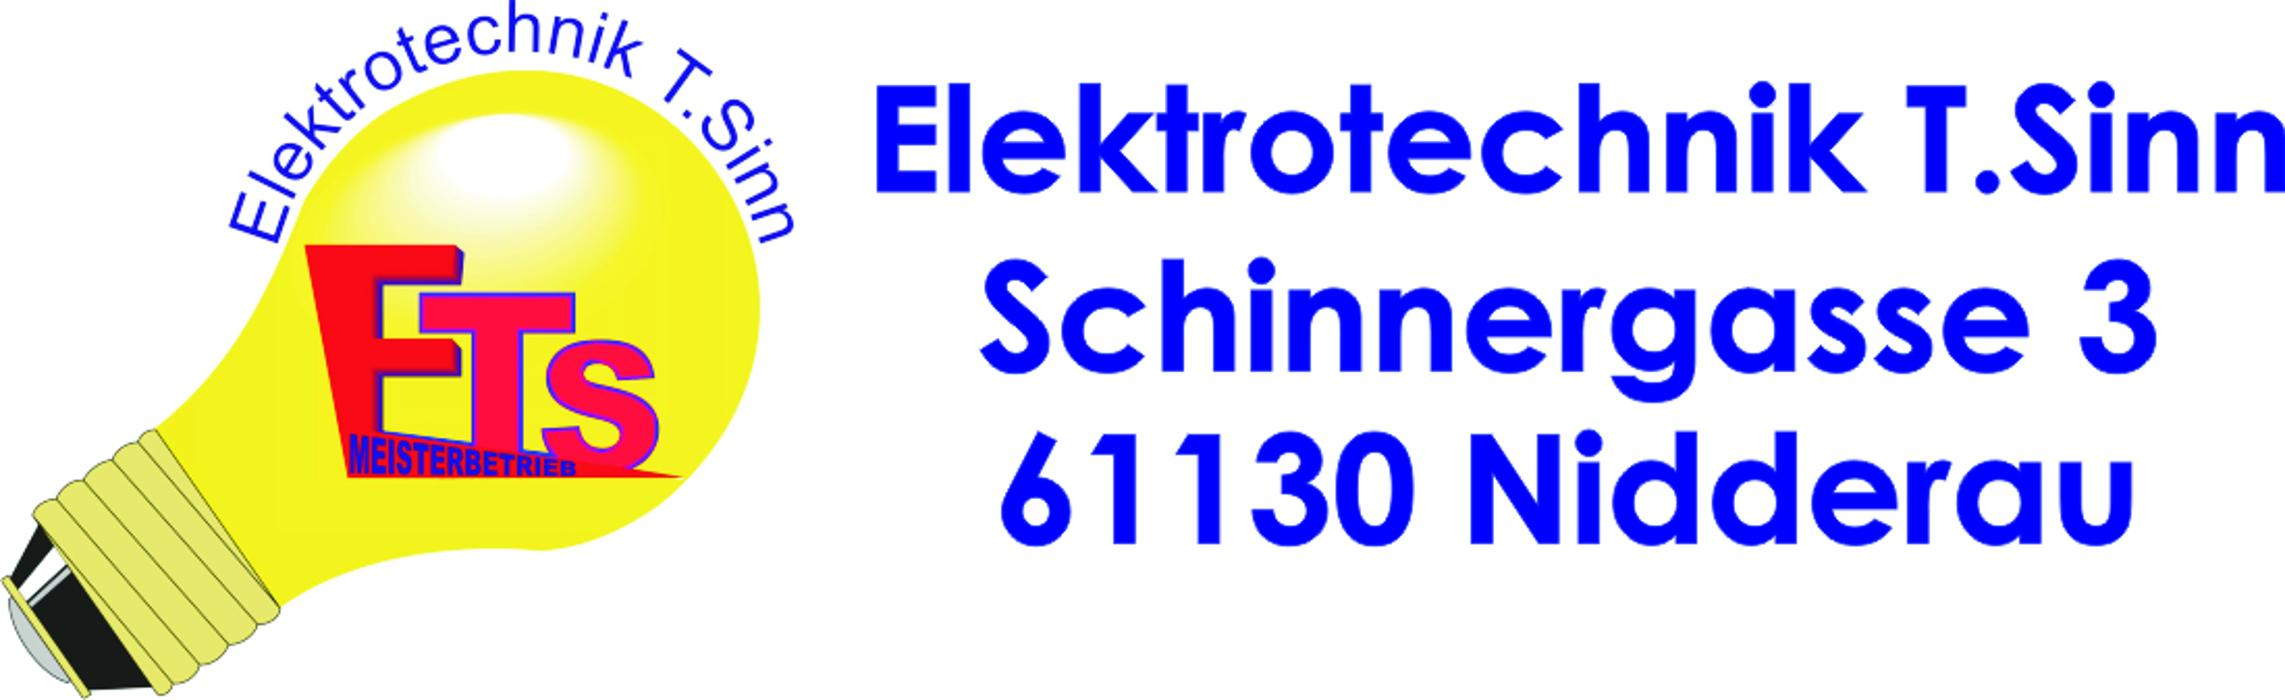 Bild zu Elektrotechnik T.Sinn in Nidderau in Hessen